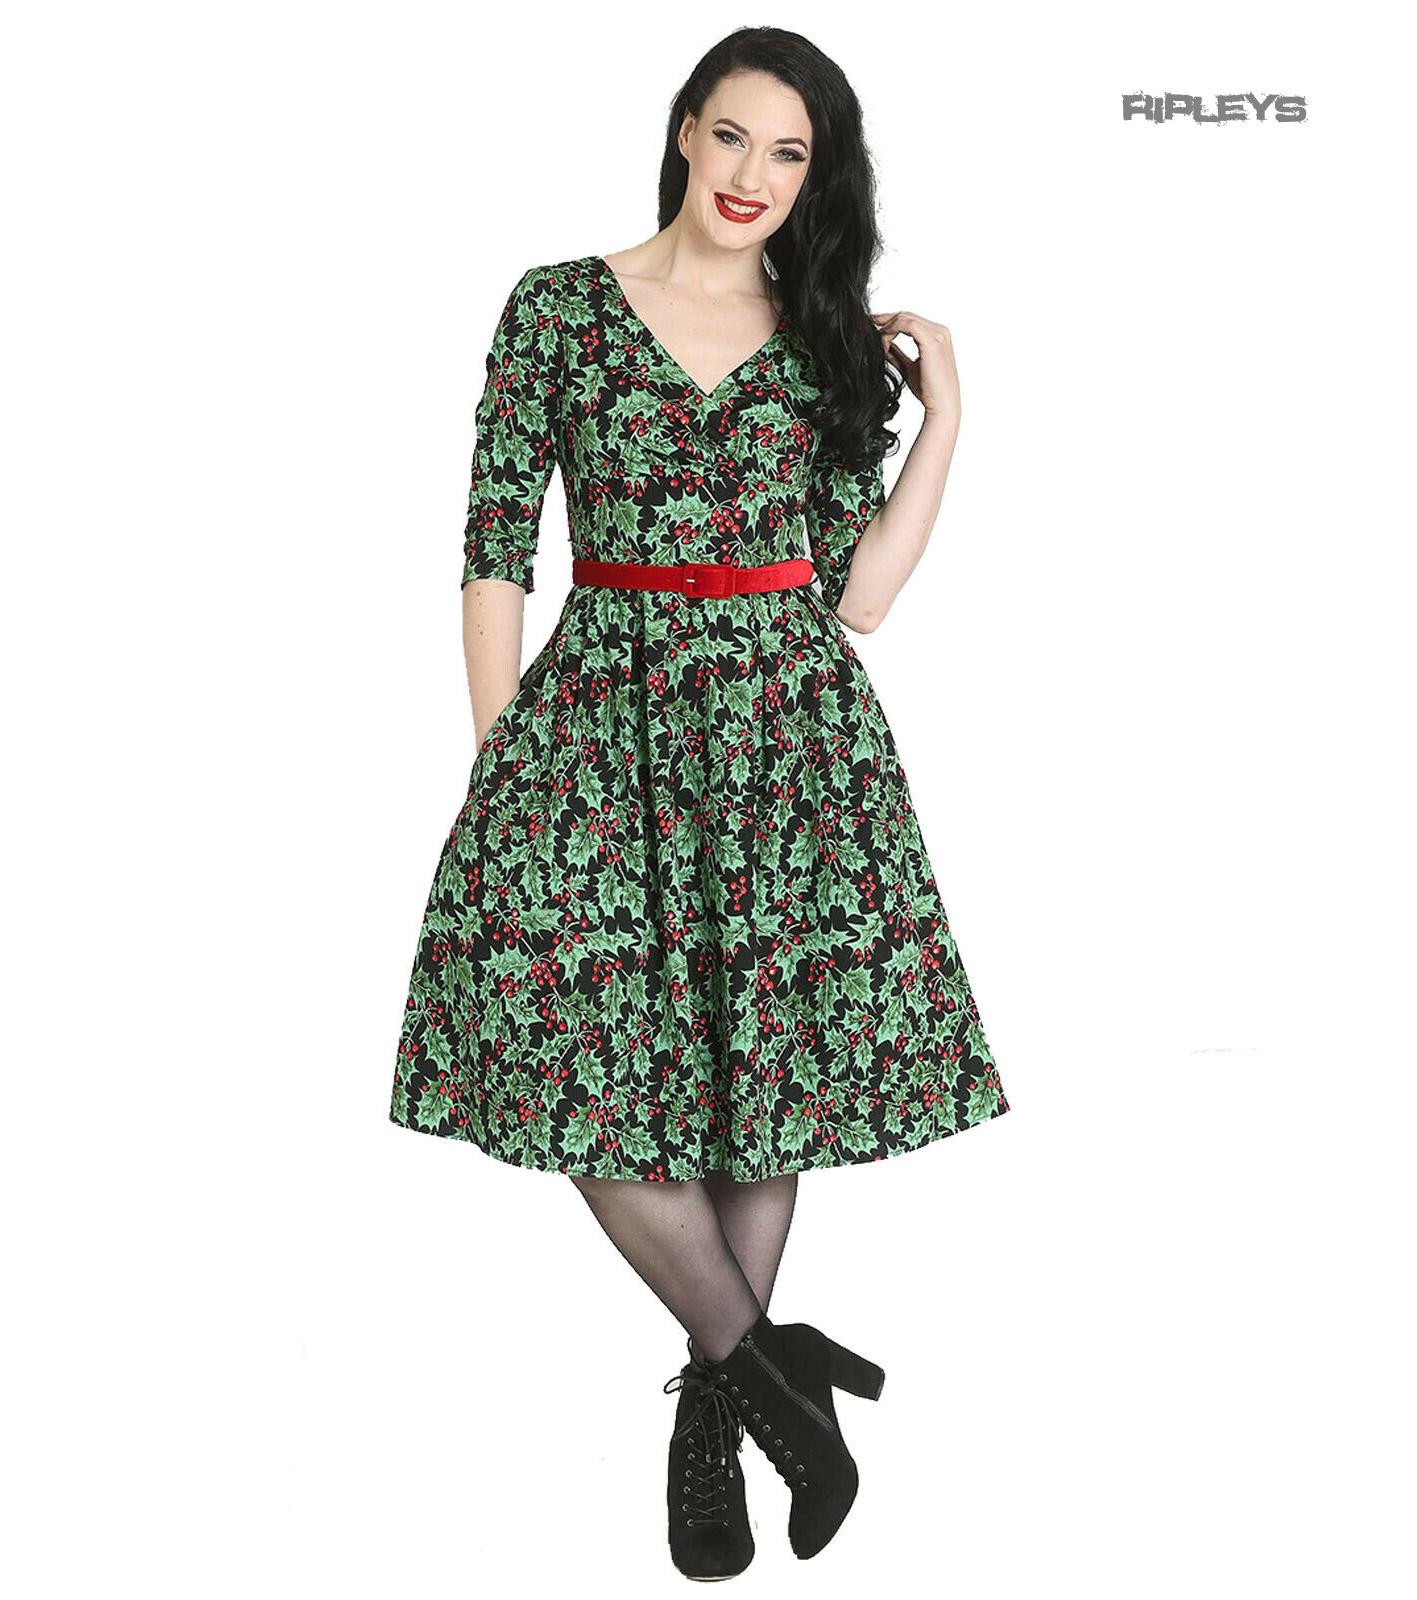 Hell-Bunny-50s-Pin-Up-Navidad-Vestido-Festivo-Rojo-Holly-Berry-Negro-Todos-los-Tamanos miniatura 14